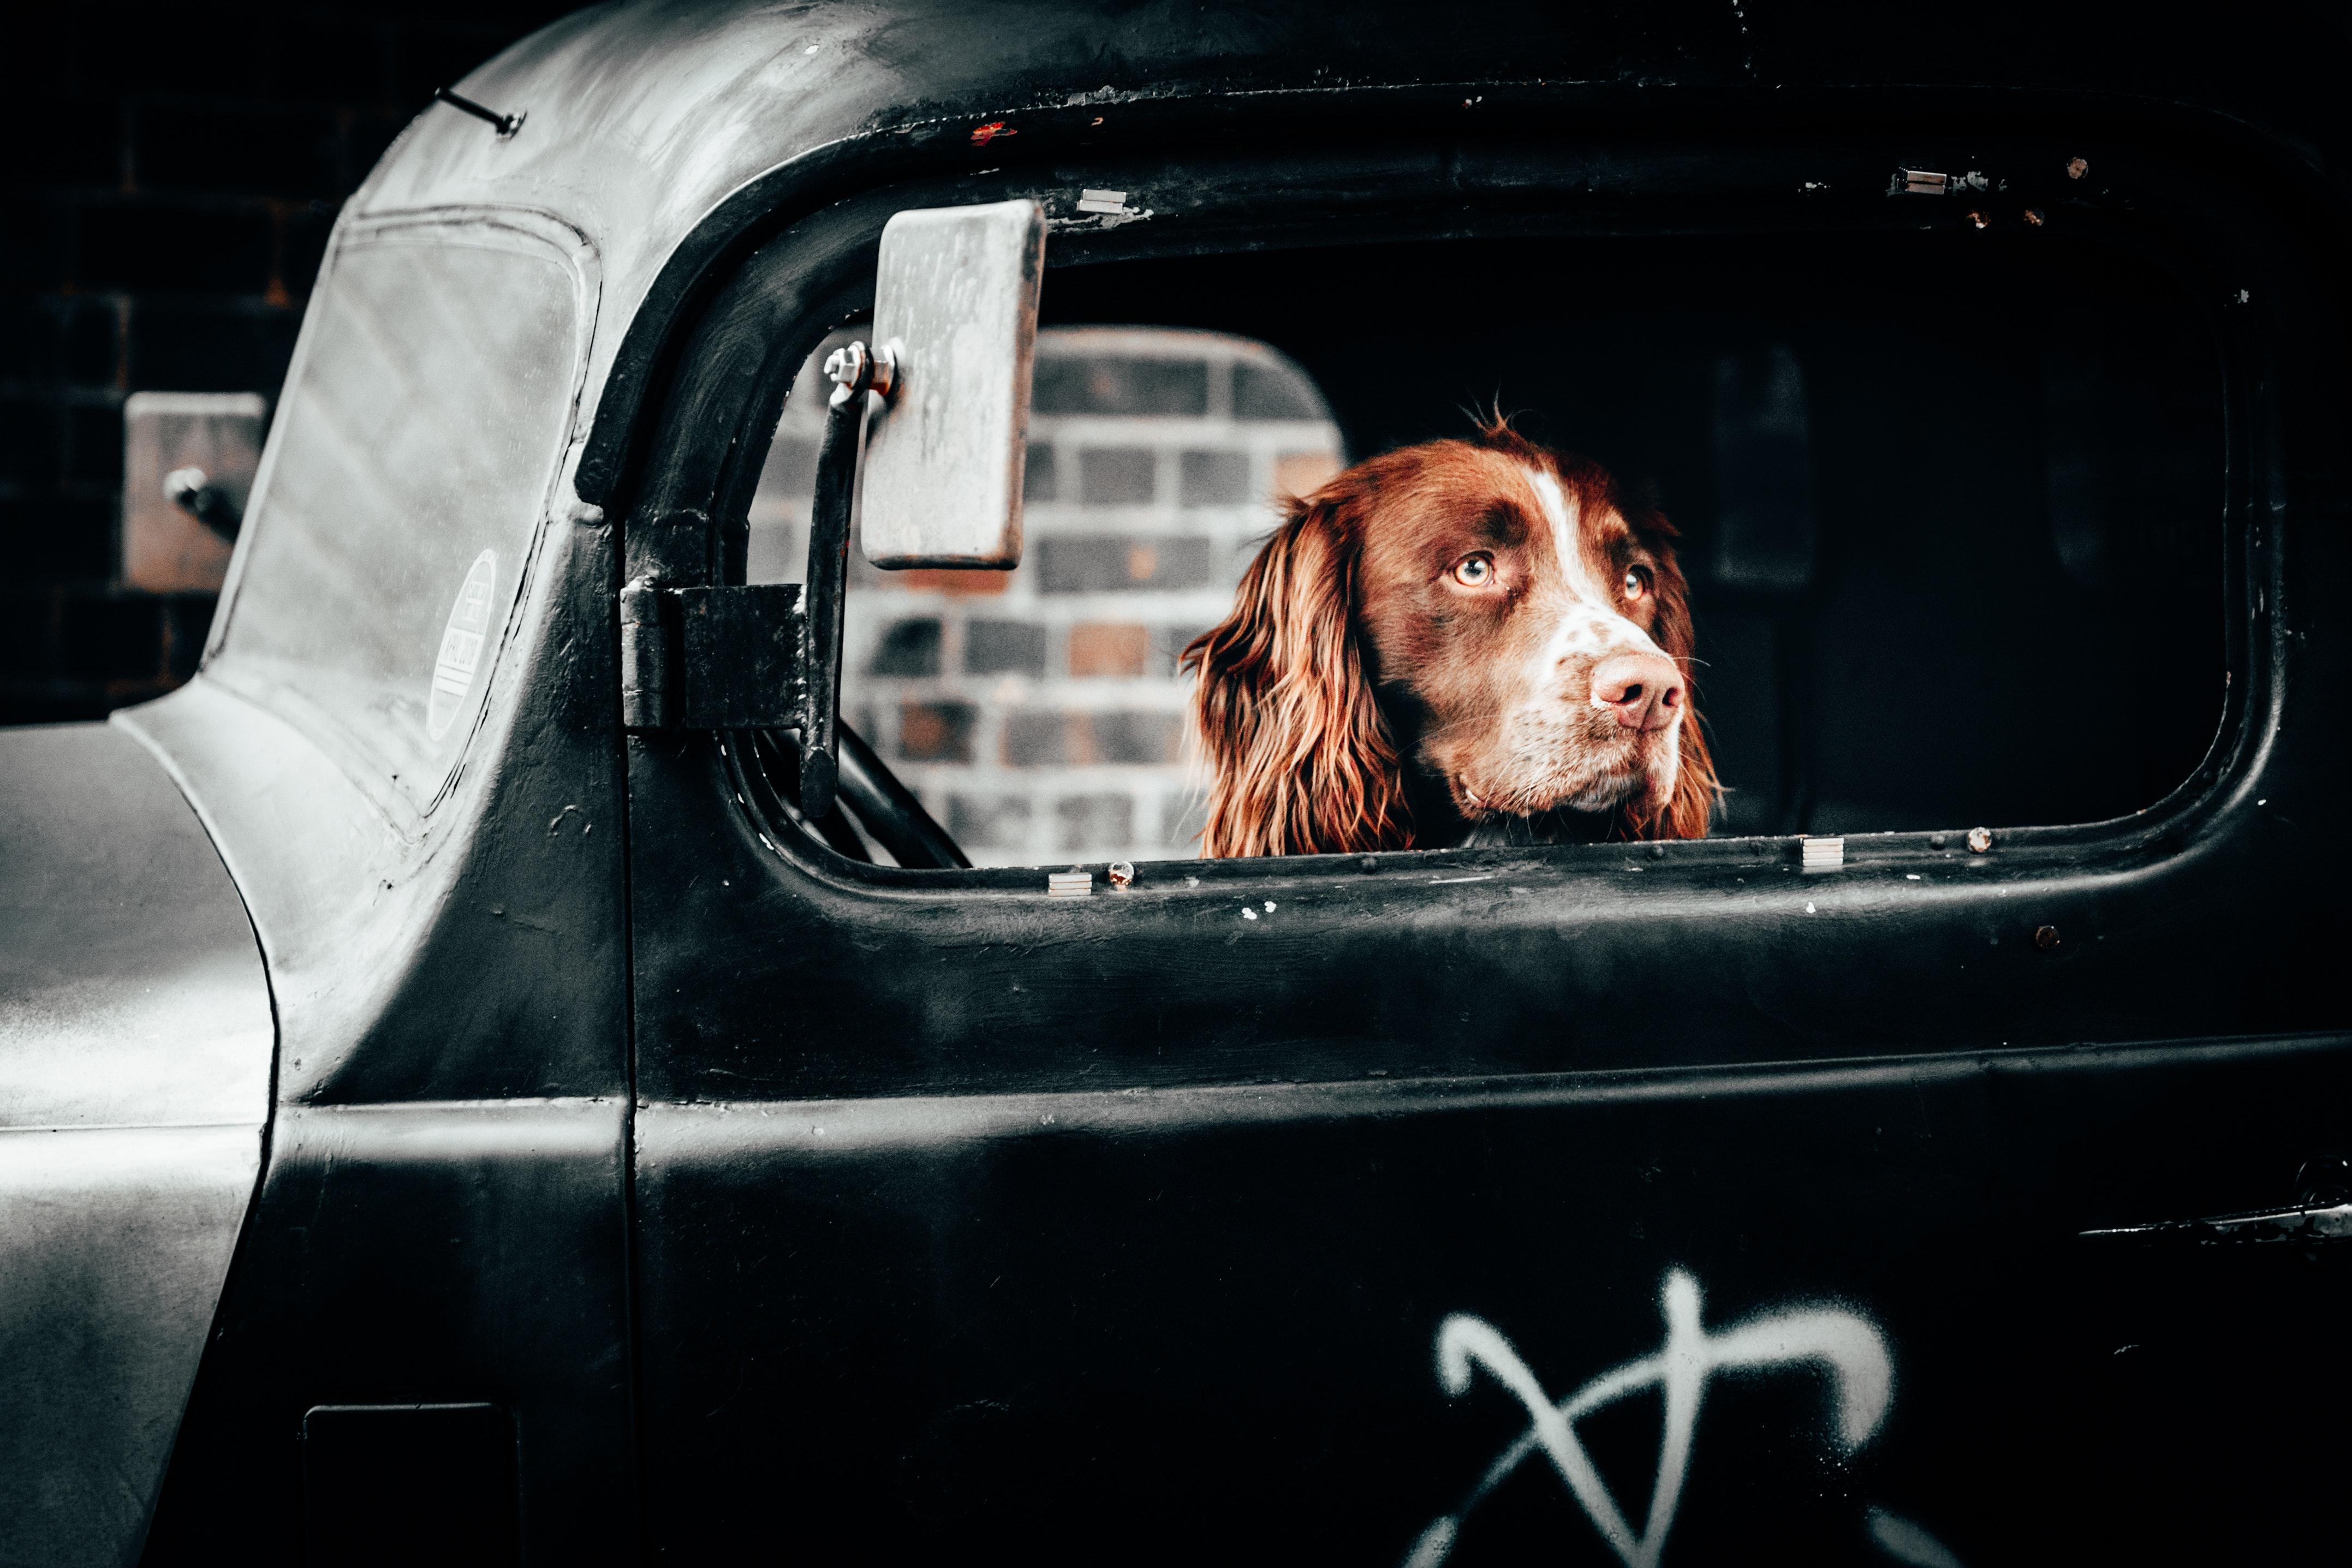 adorable-animal-black-car-2536231